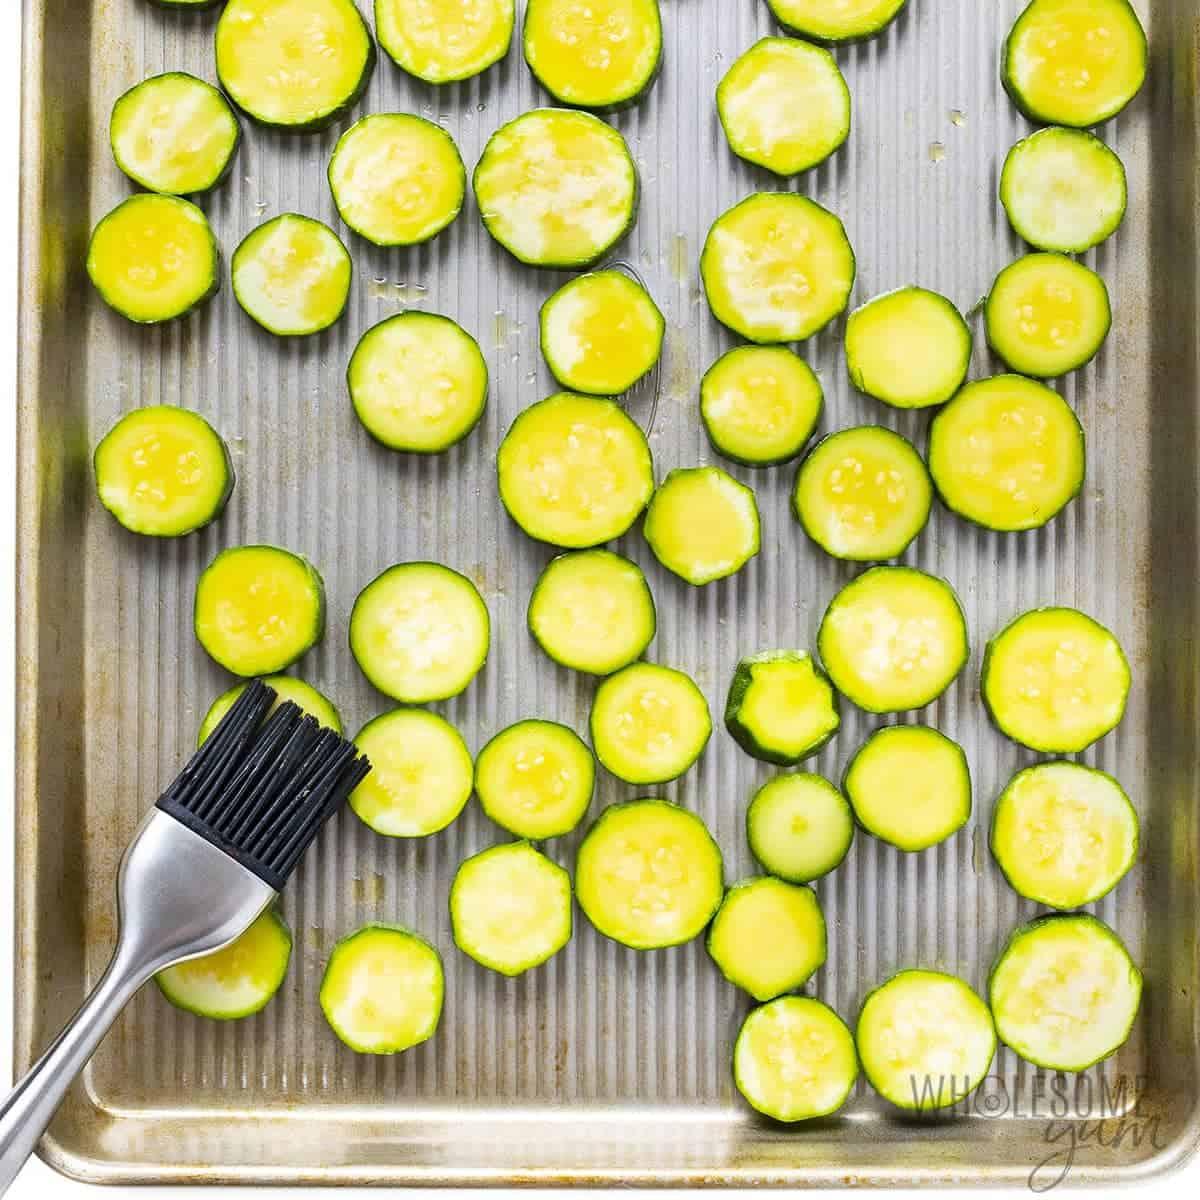 Zucchini slices roasting on a baking sheet